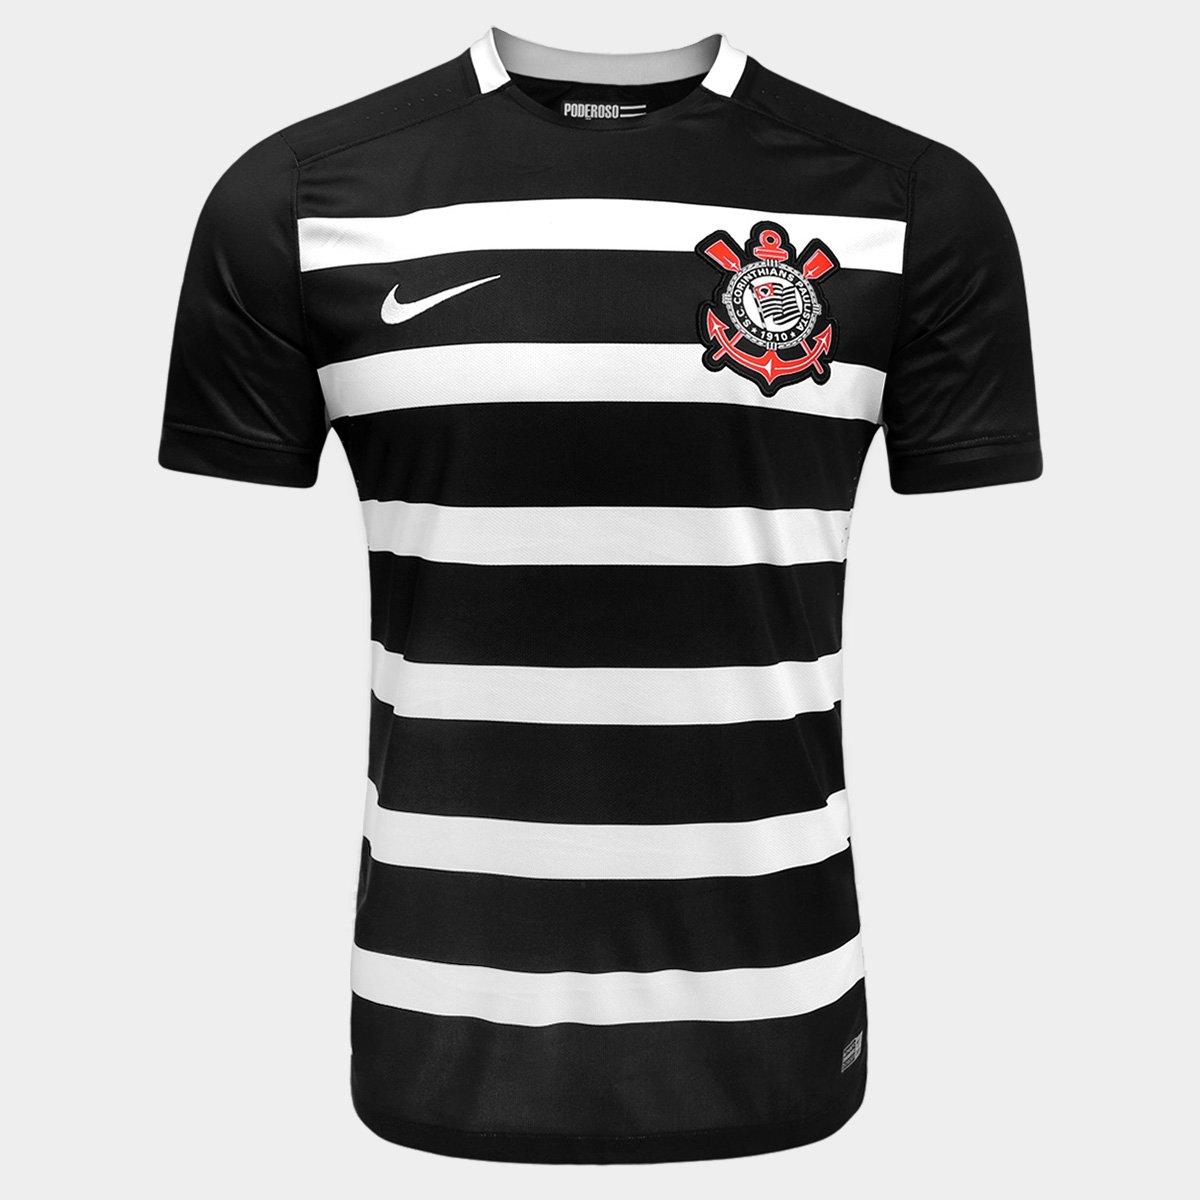 d491efdb9d4d4 Camisa Corinthians II 15 16 s nº Torcedor Nike Masculina - Compre Agora